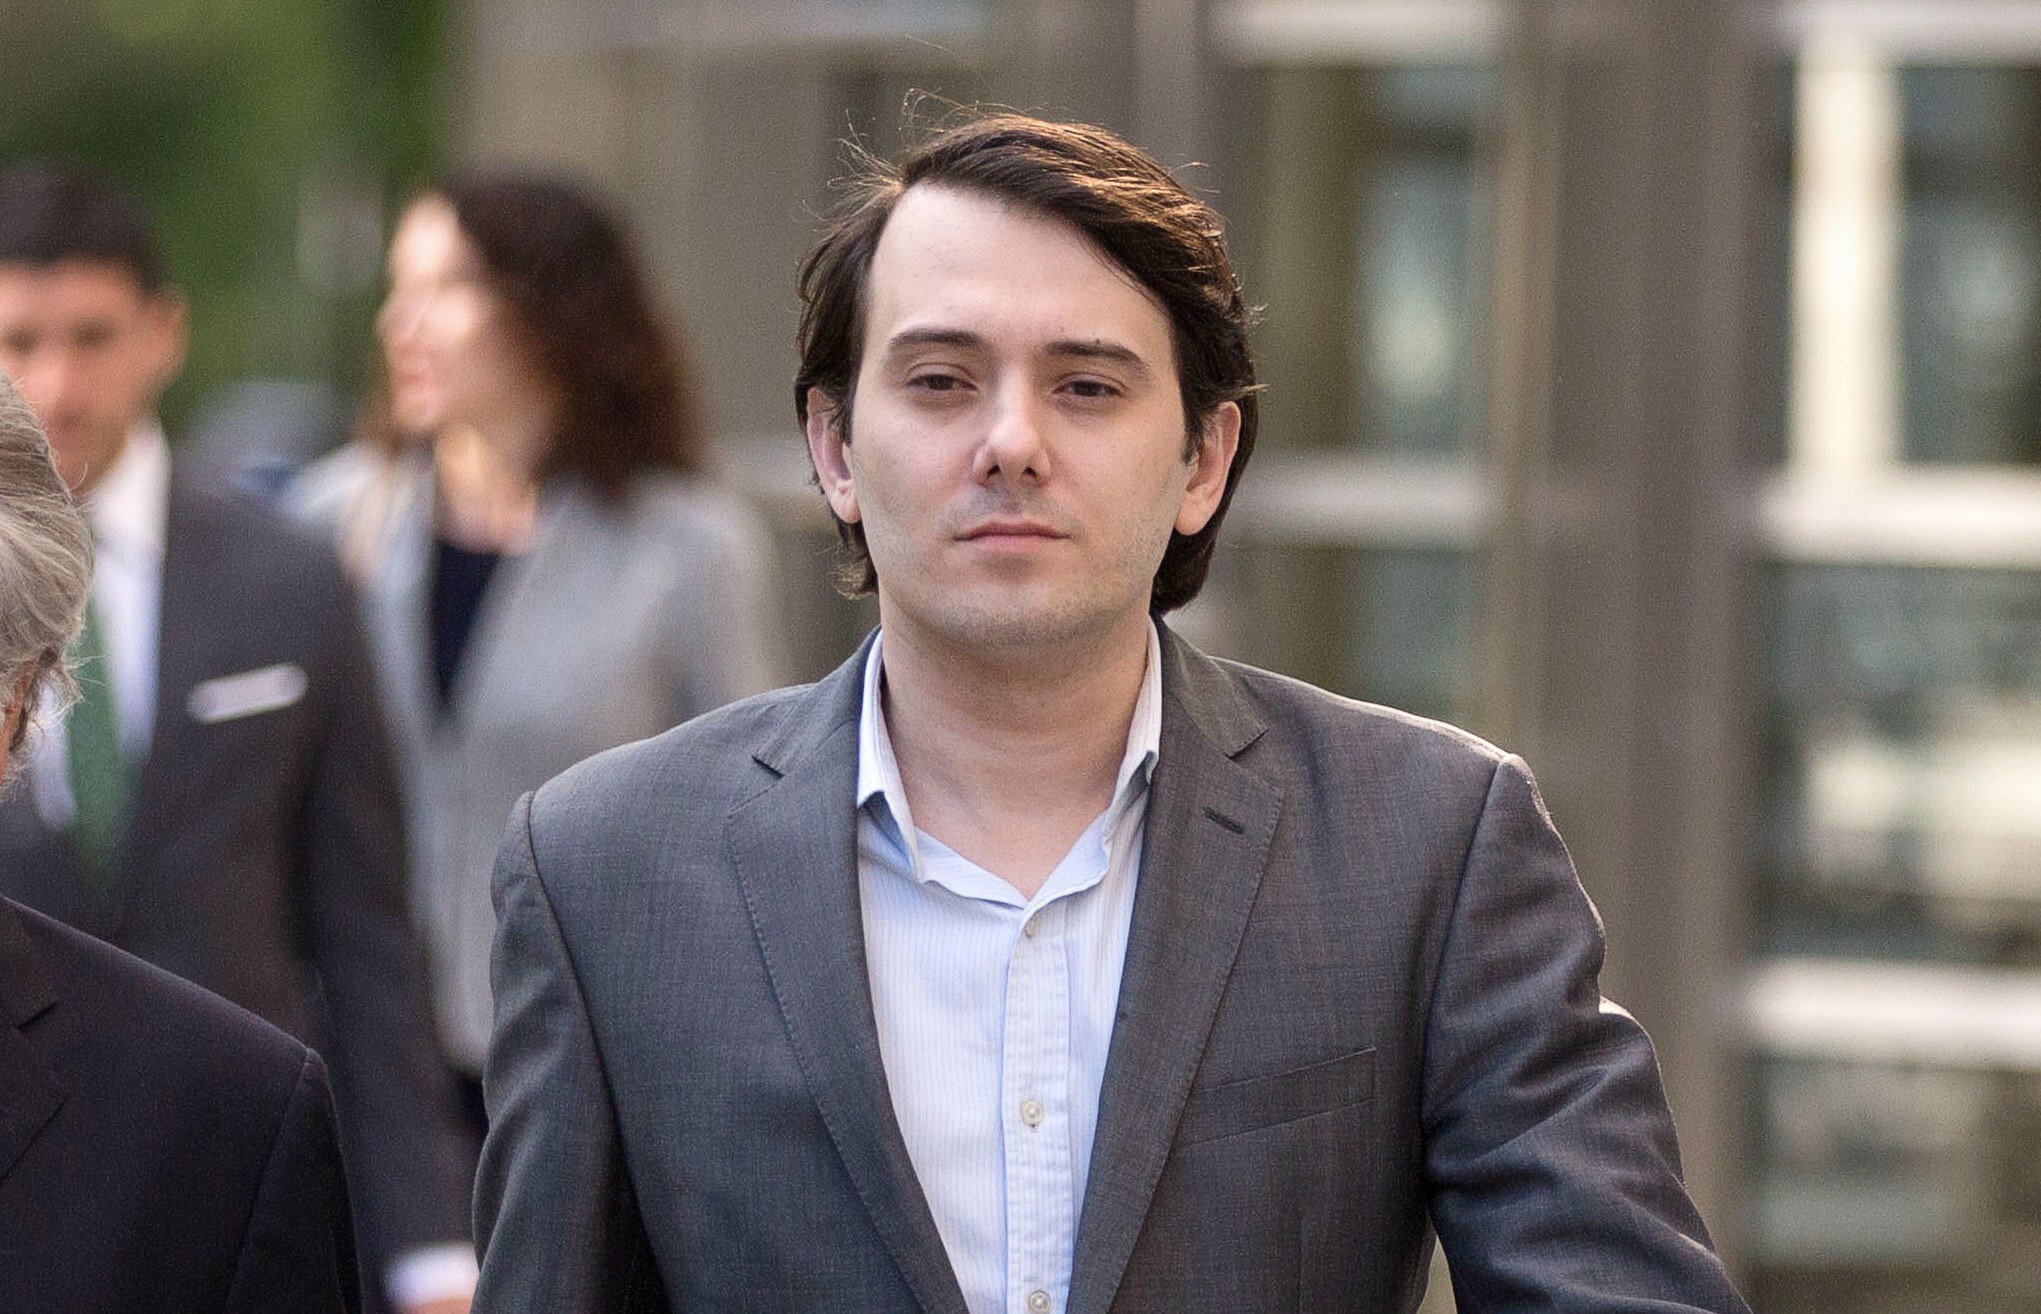 Jury Selection Begins In Martin Shkreli Securities Fraud Trial